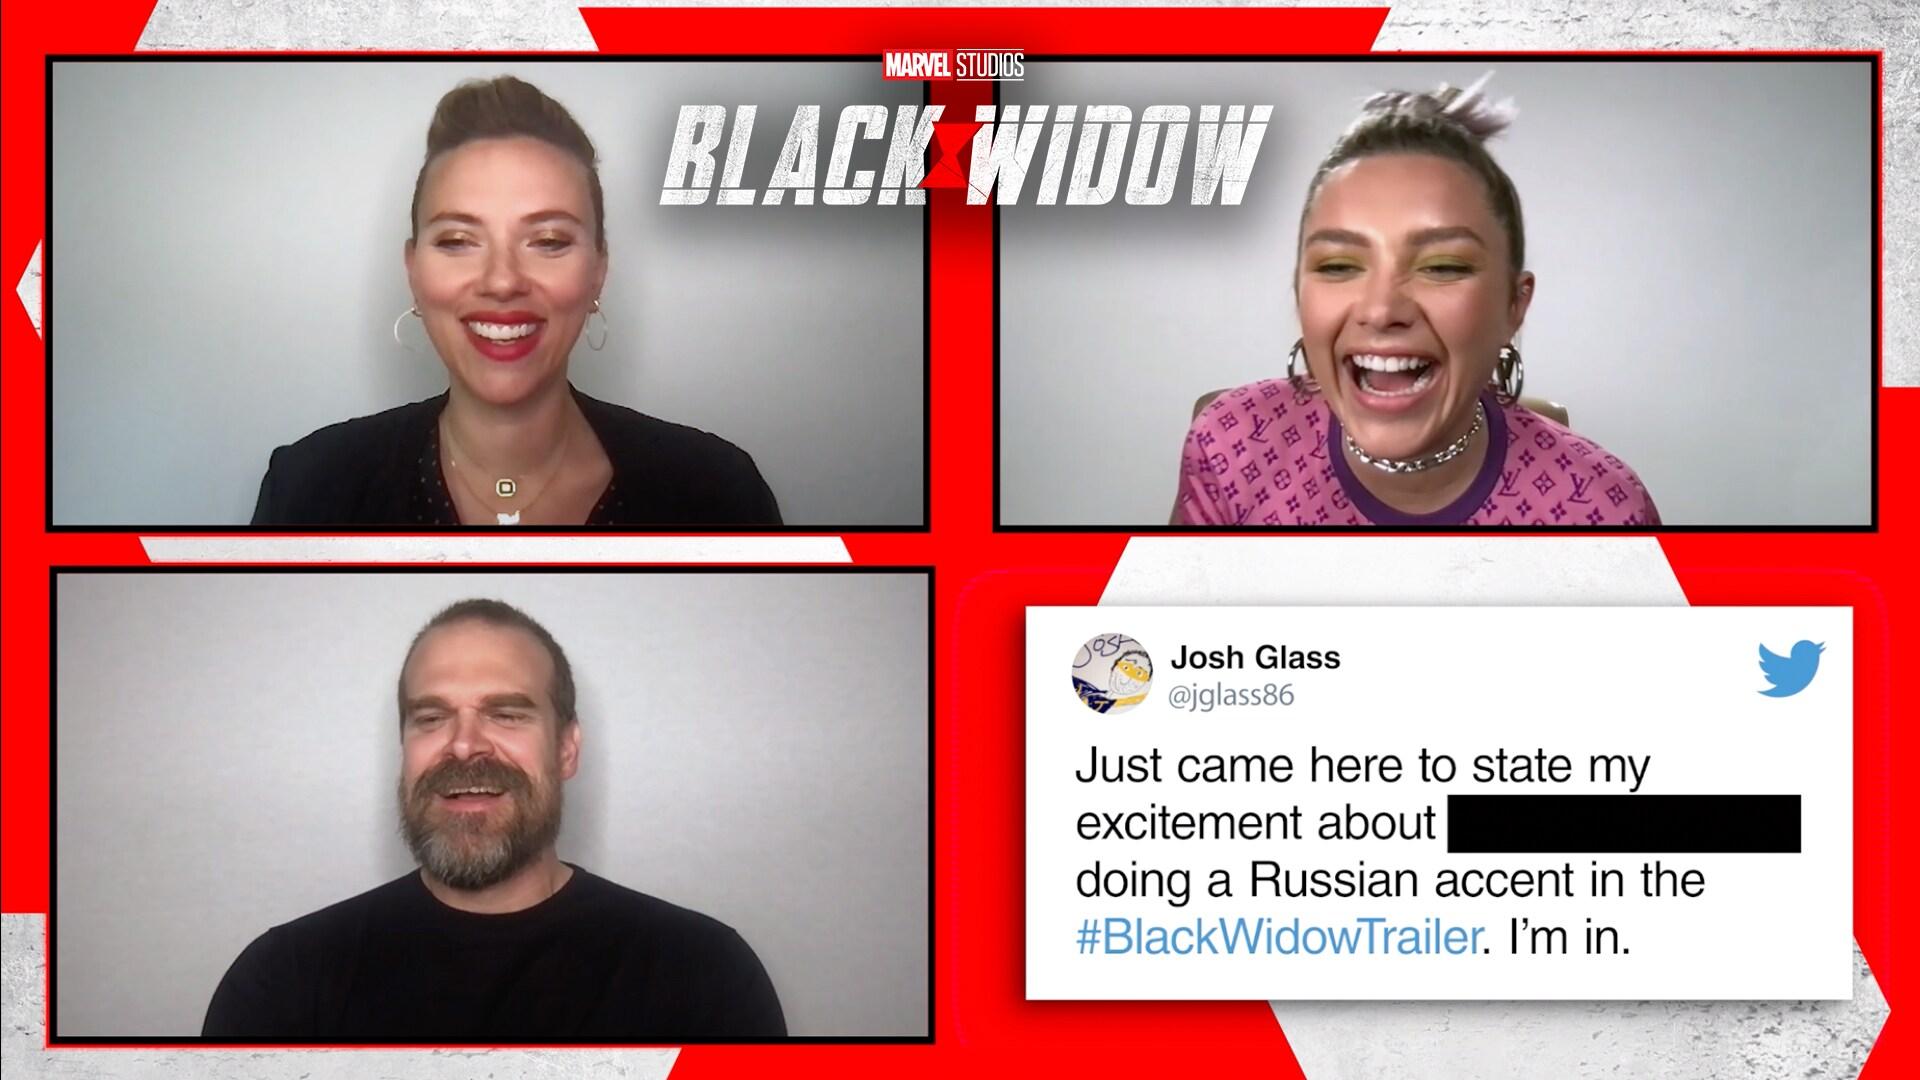 Who's That Tweet About Challenge | Marvel Studios' Black Widow